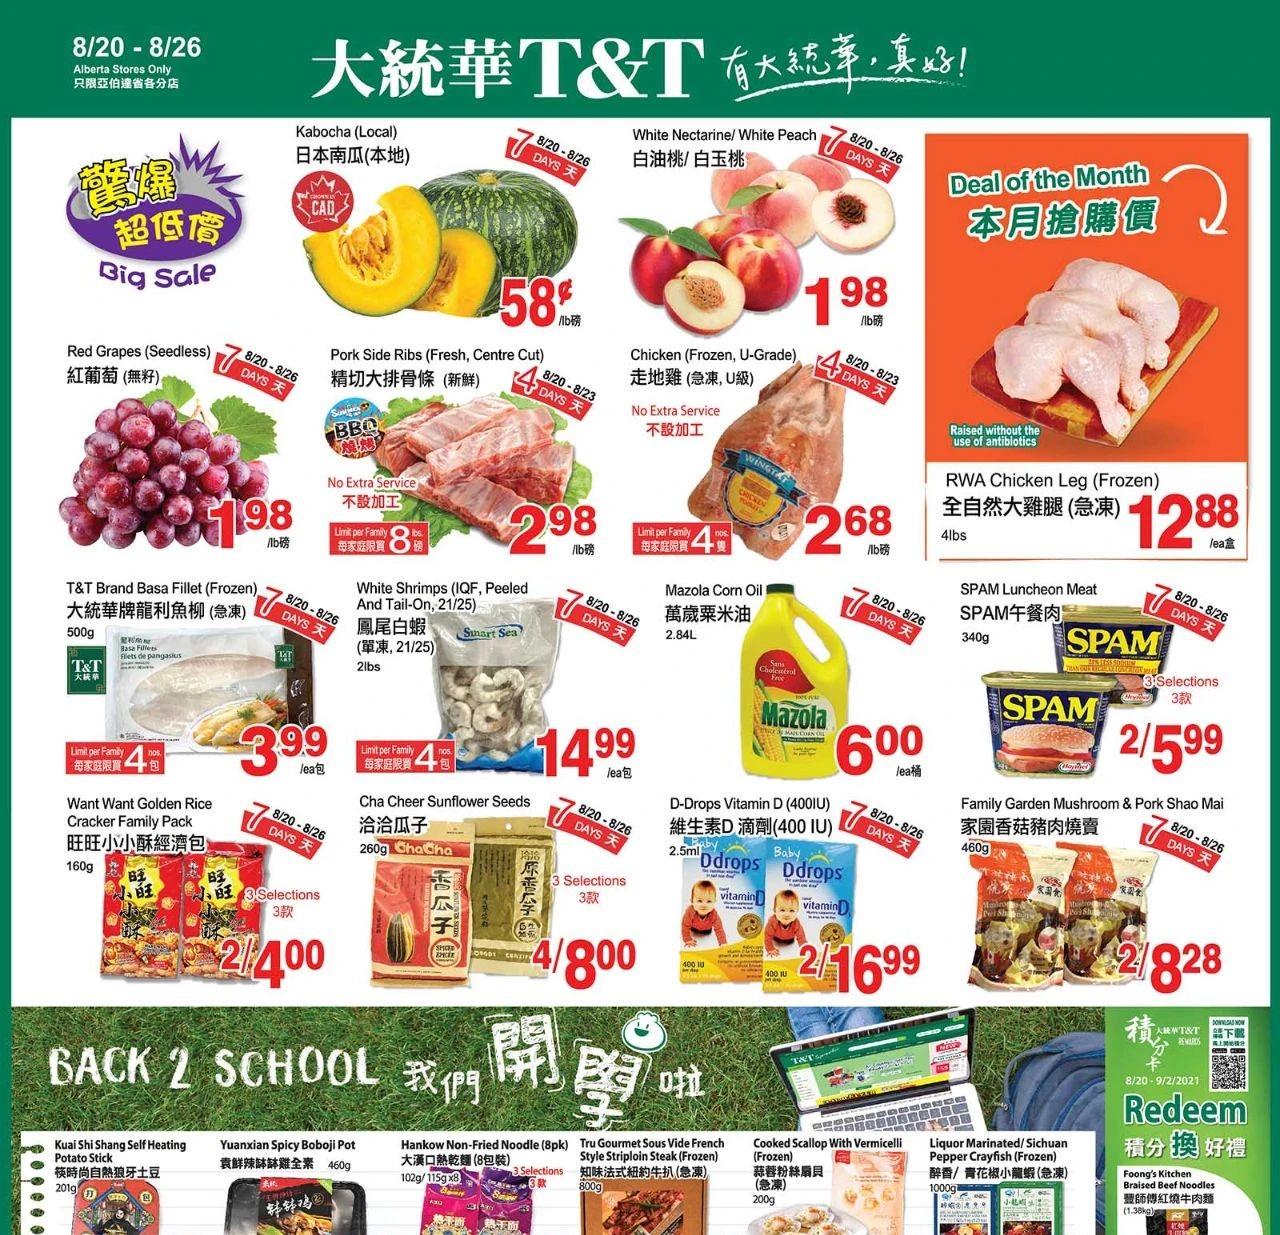 TNT Supermarket AB Flyer   Aug 20